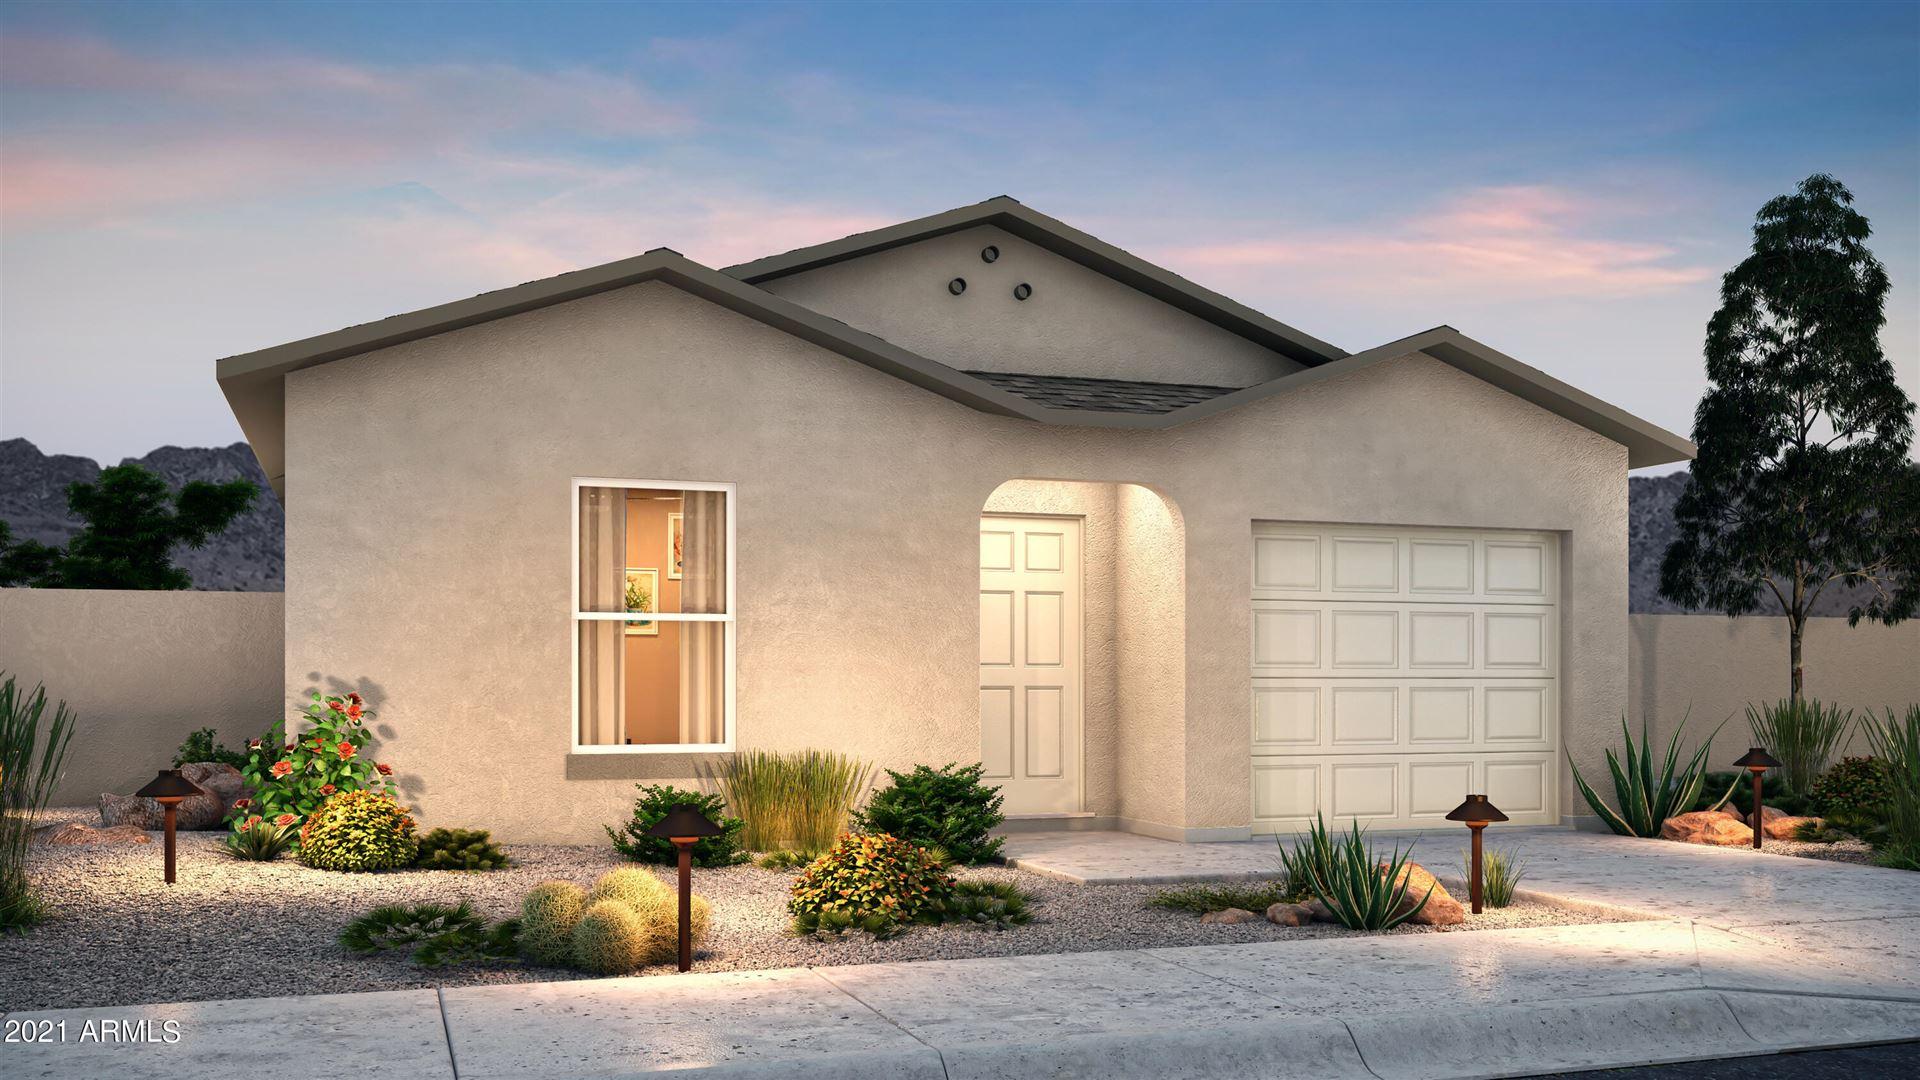 Photo of 520 Cahan Drive, Morristown, AZ 85342 (MLS # 6299171)